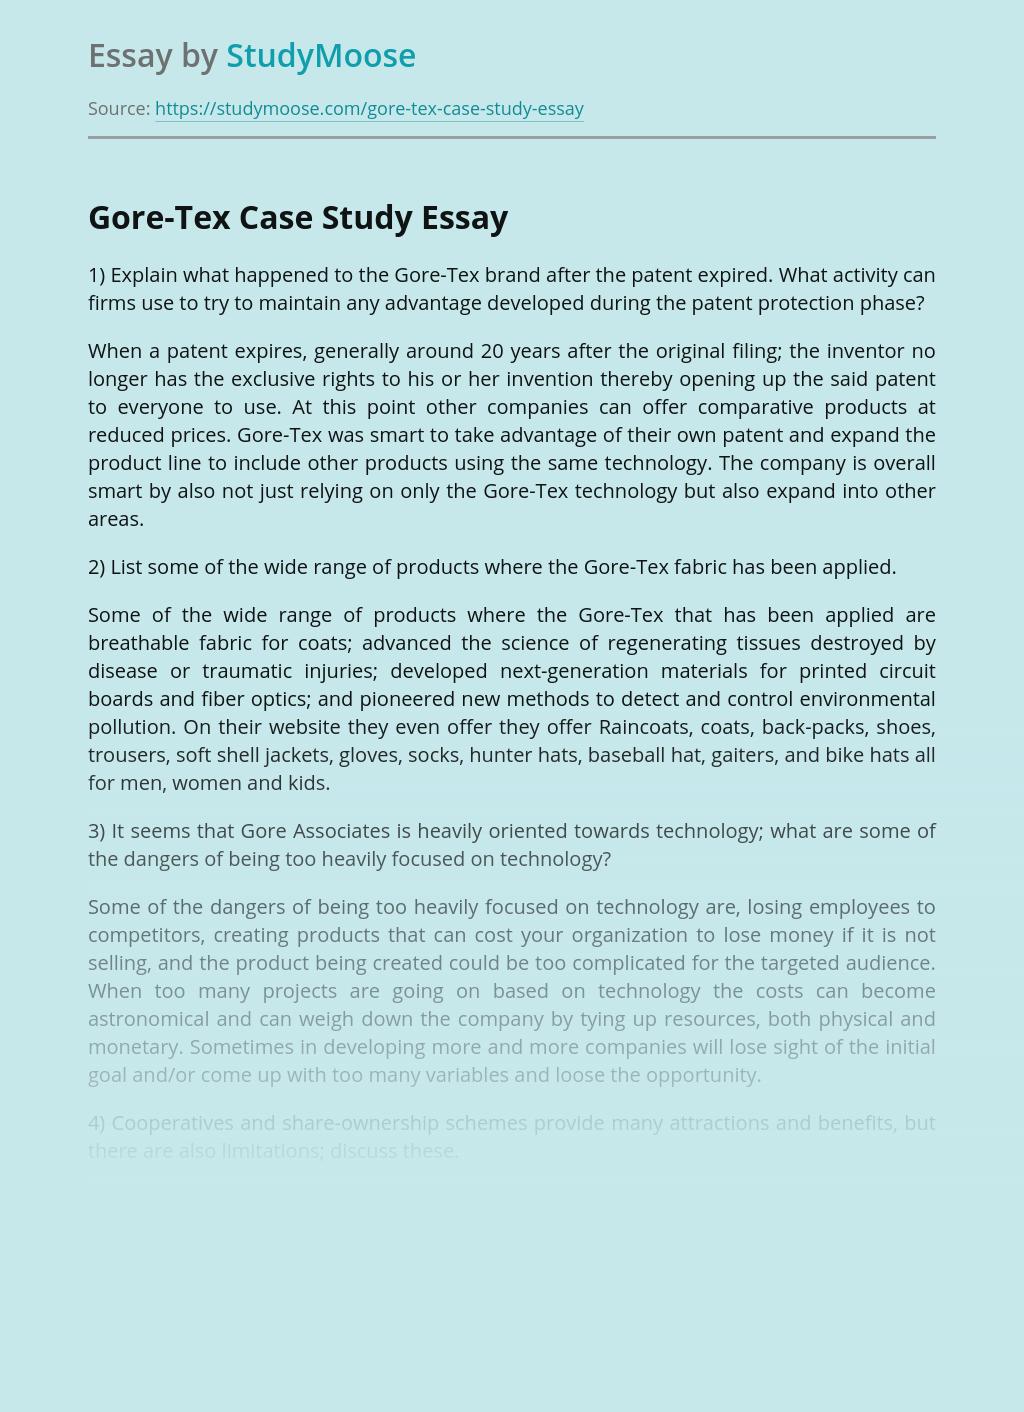 Gore-Tex Case Study